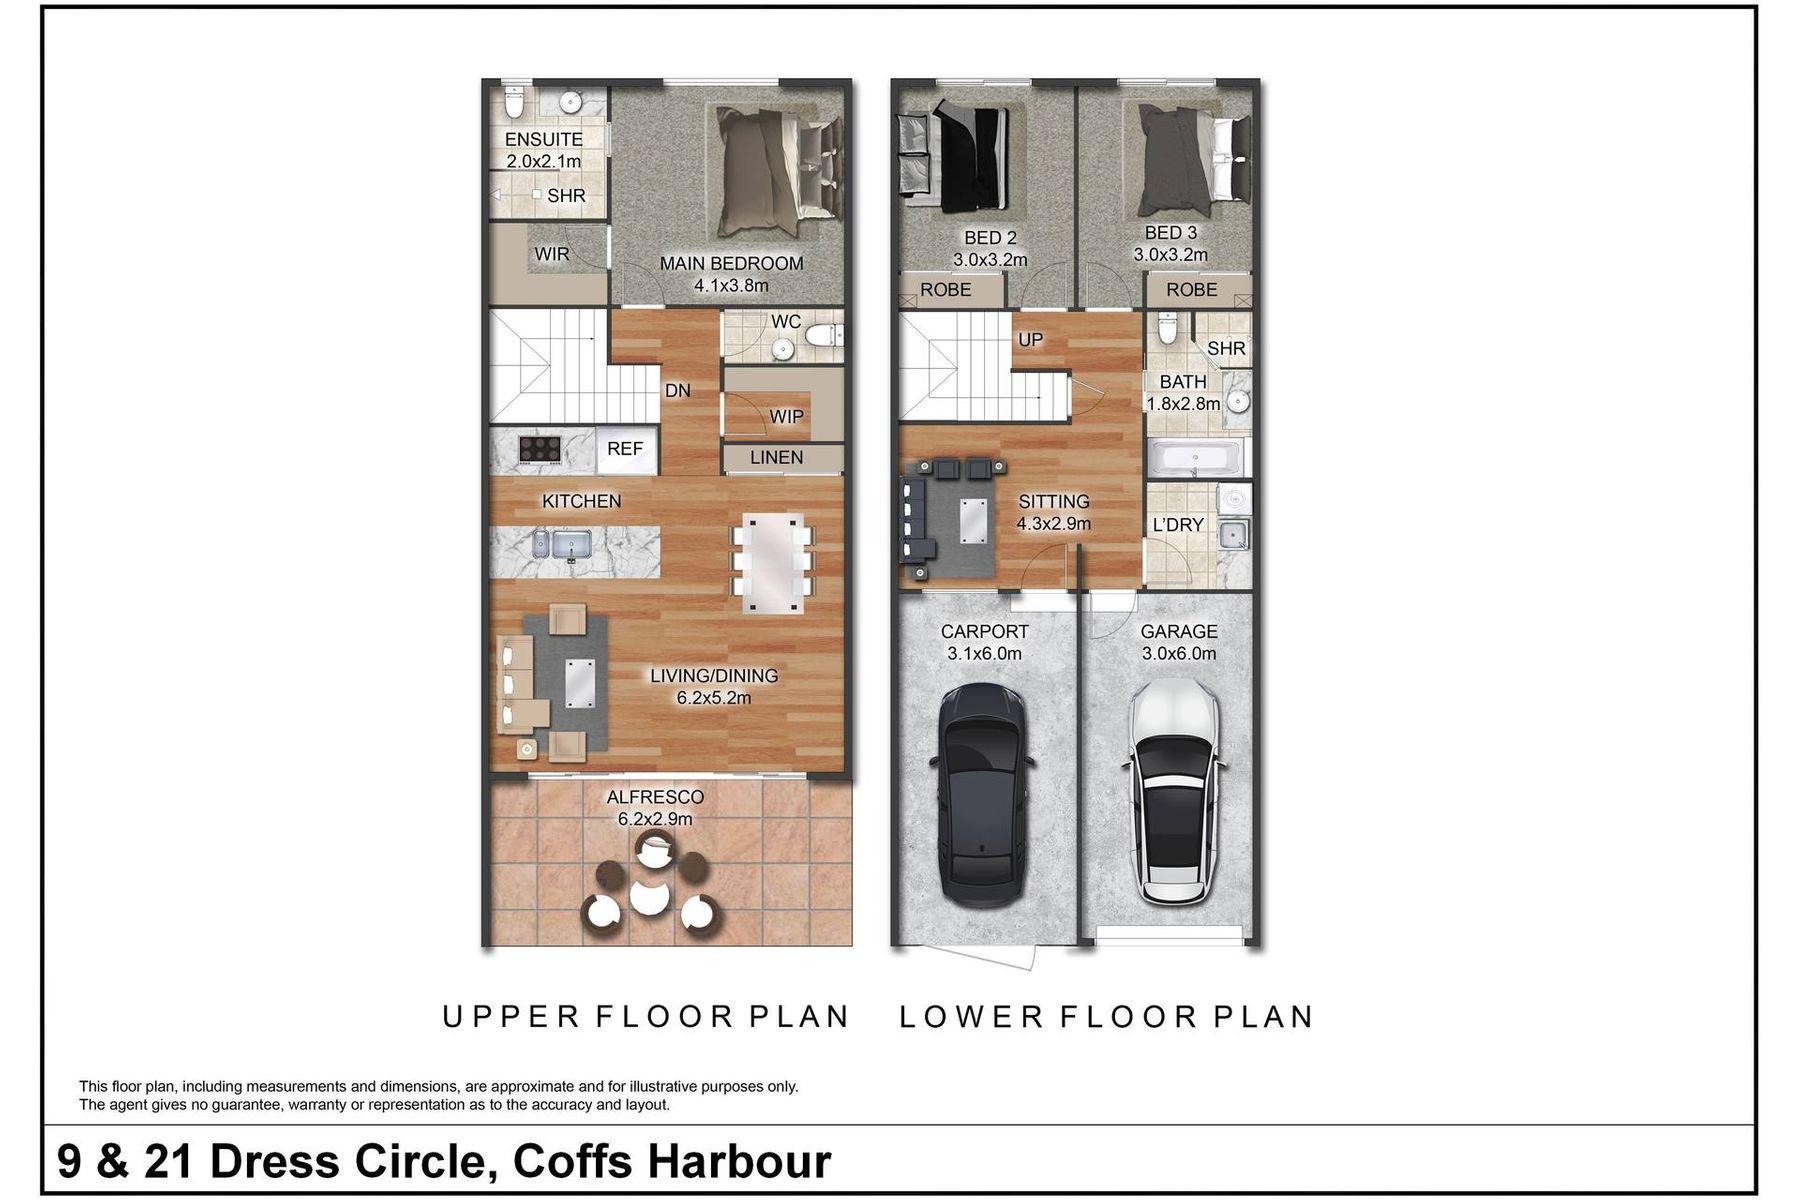 5 Dress Circle, Coffs Harbour, NSW 2450